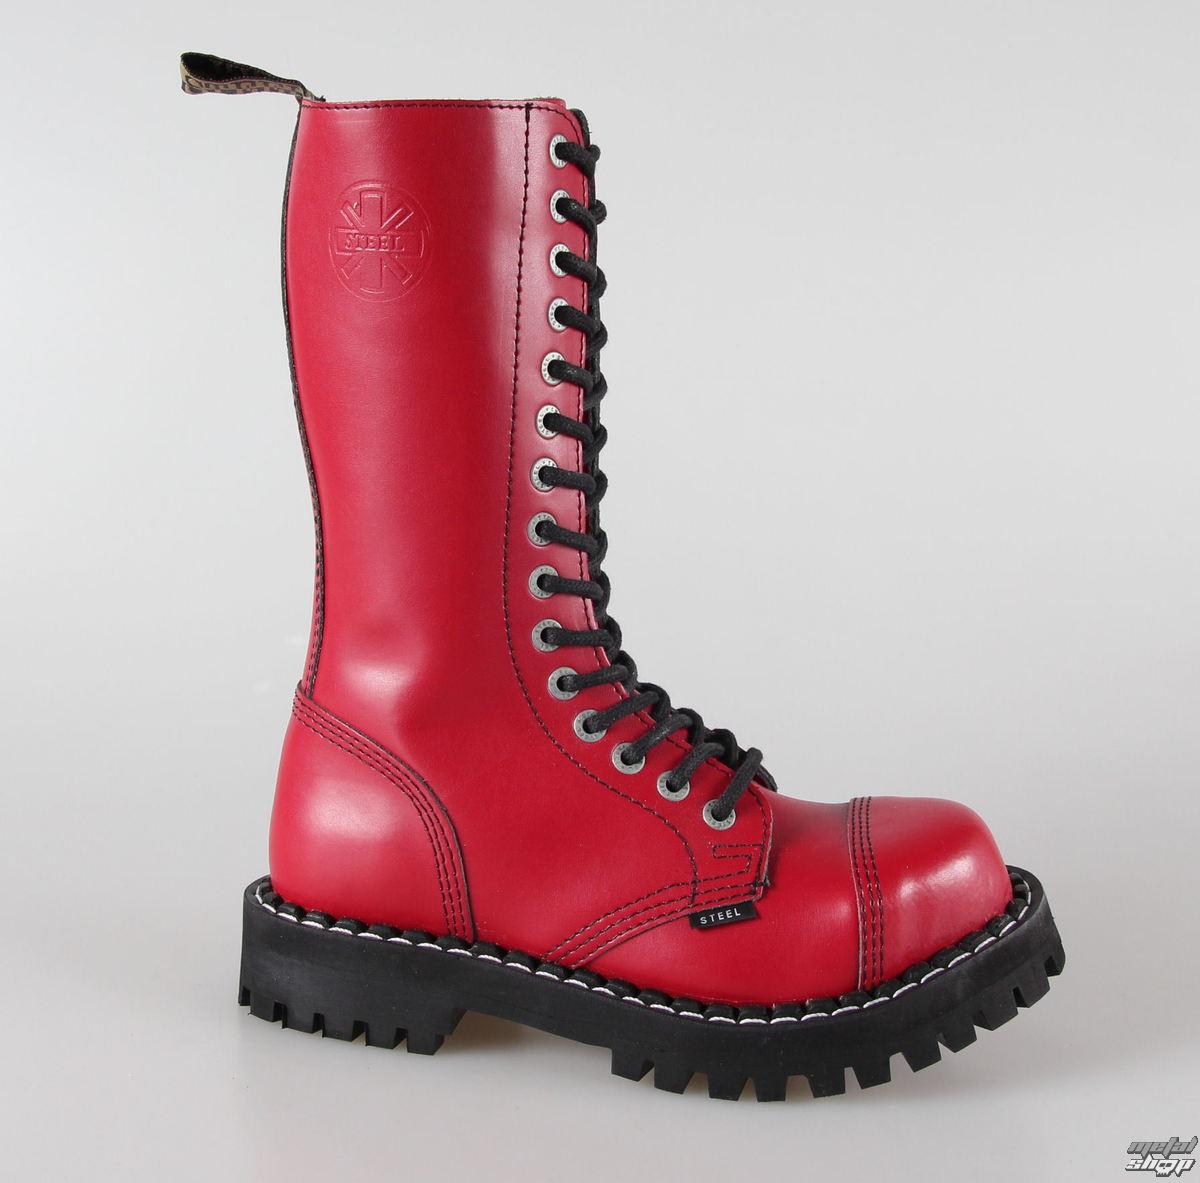 topánky STEEL - 10 dierkové čierne ( 105 106 Black) 10tich-dierkové ... bd8bac2f0be